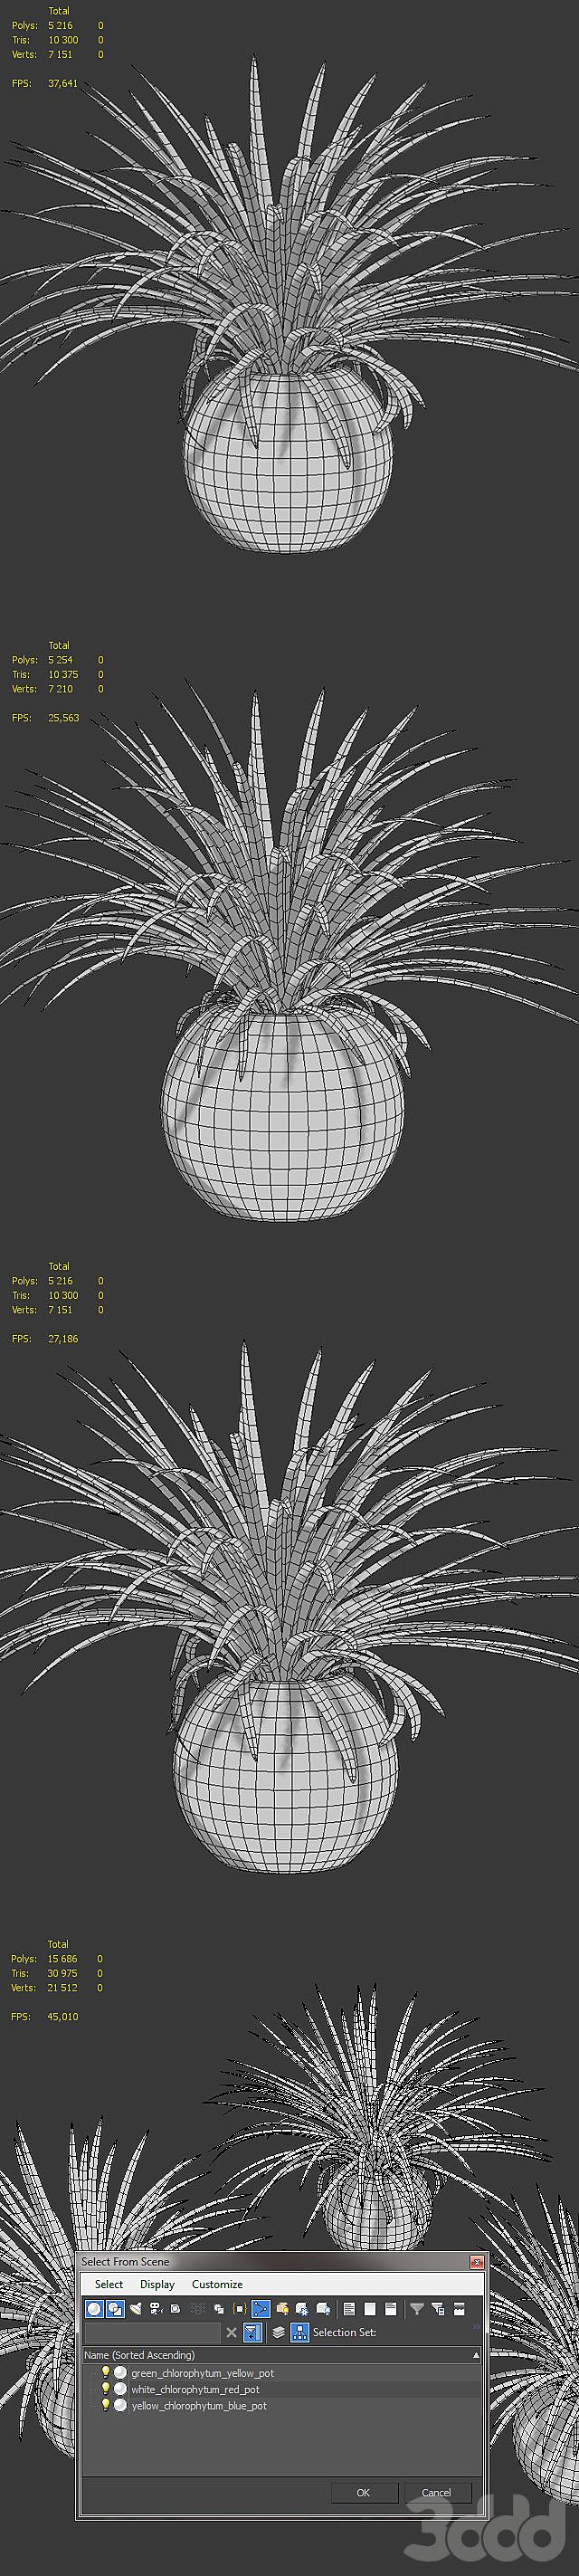 Home plant v3_6 (Realistic)